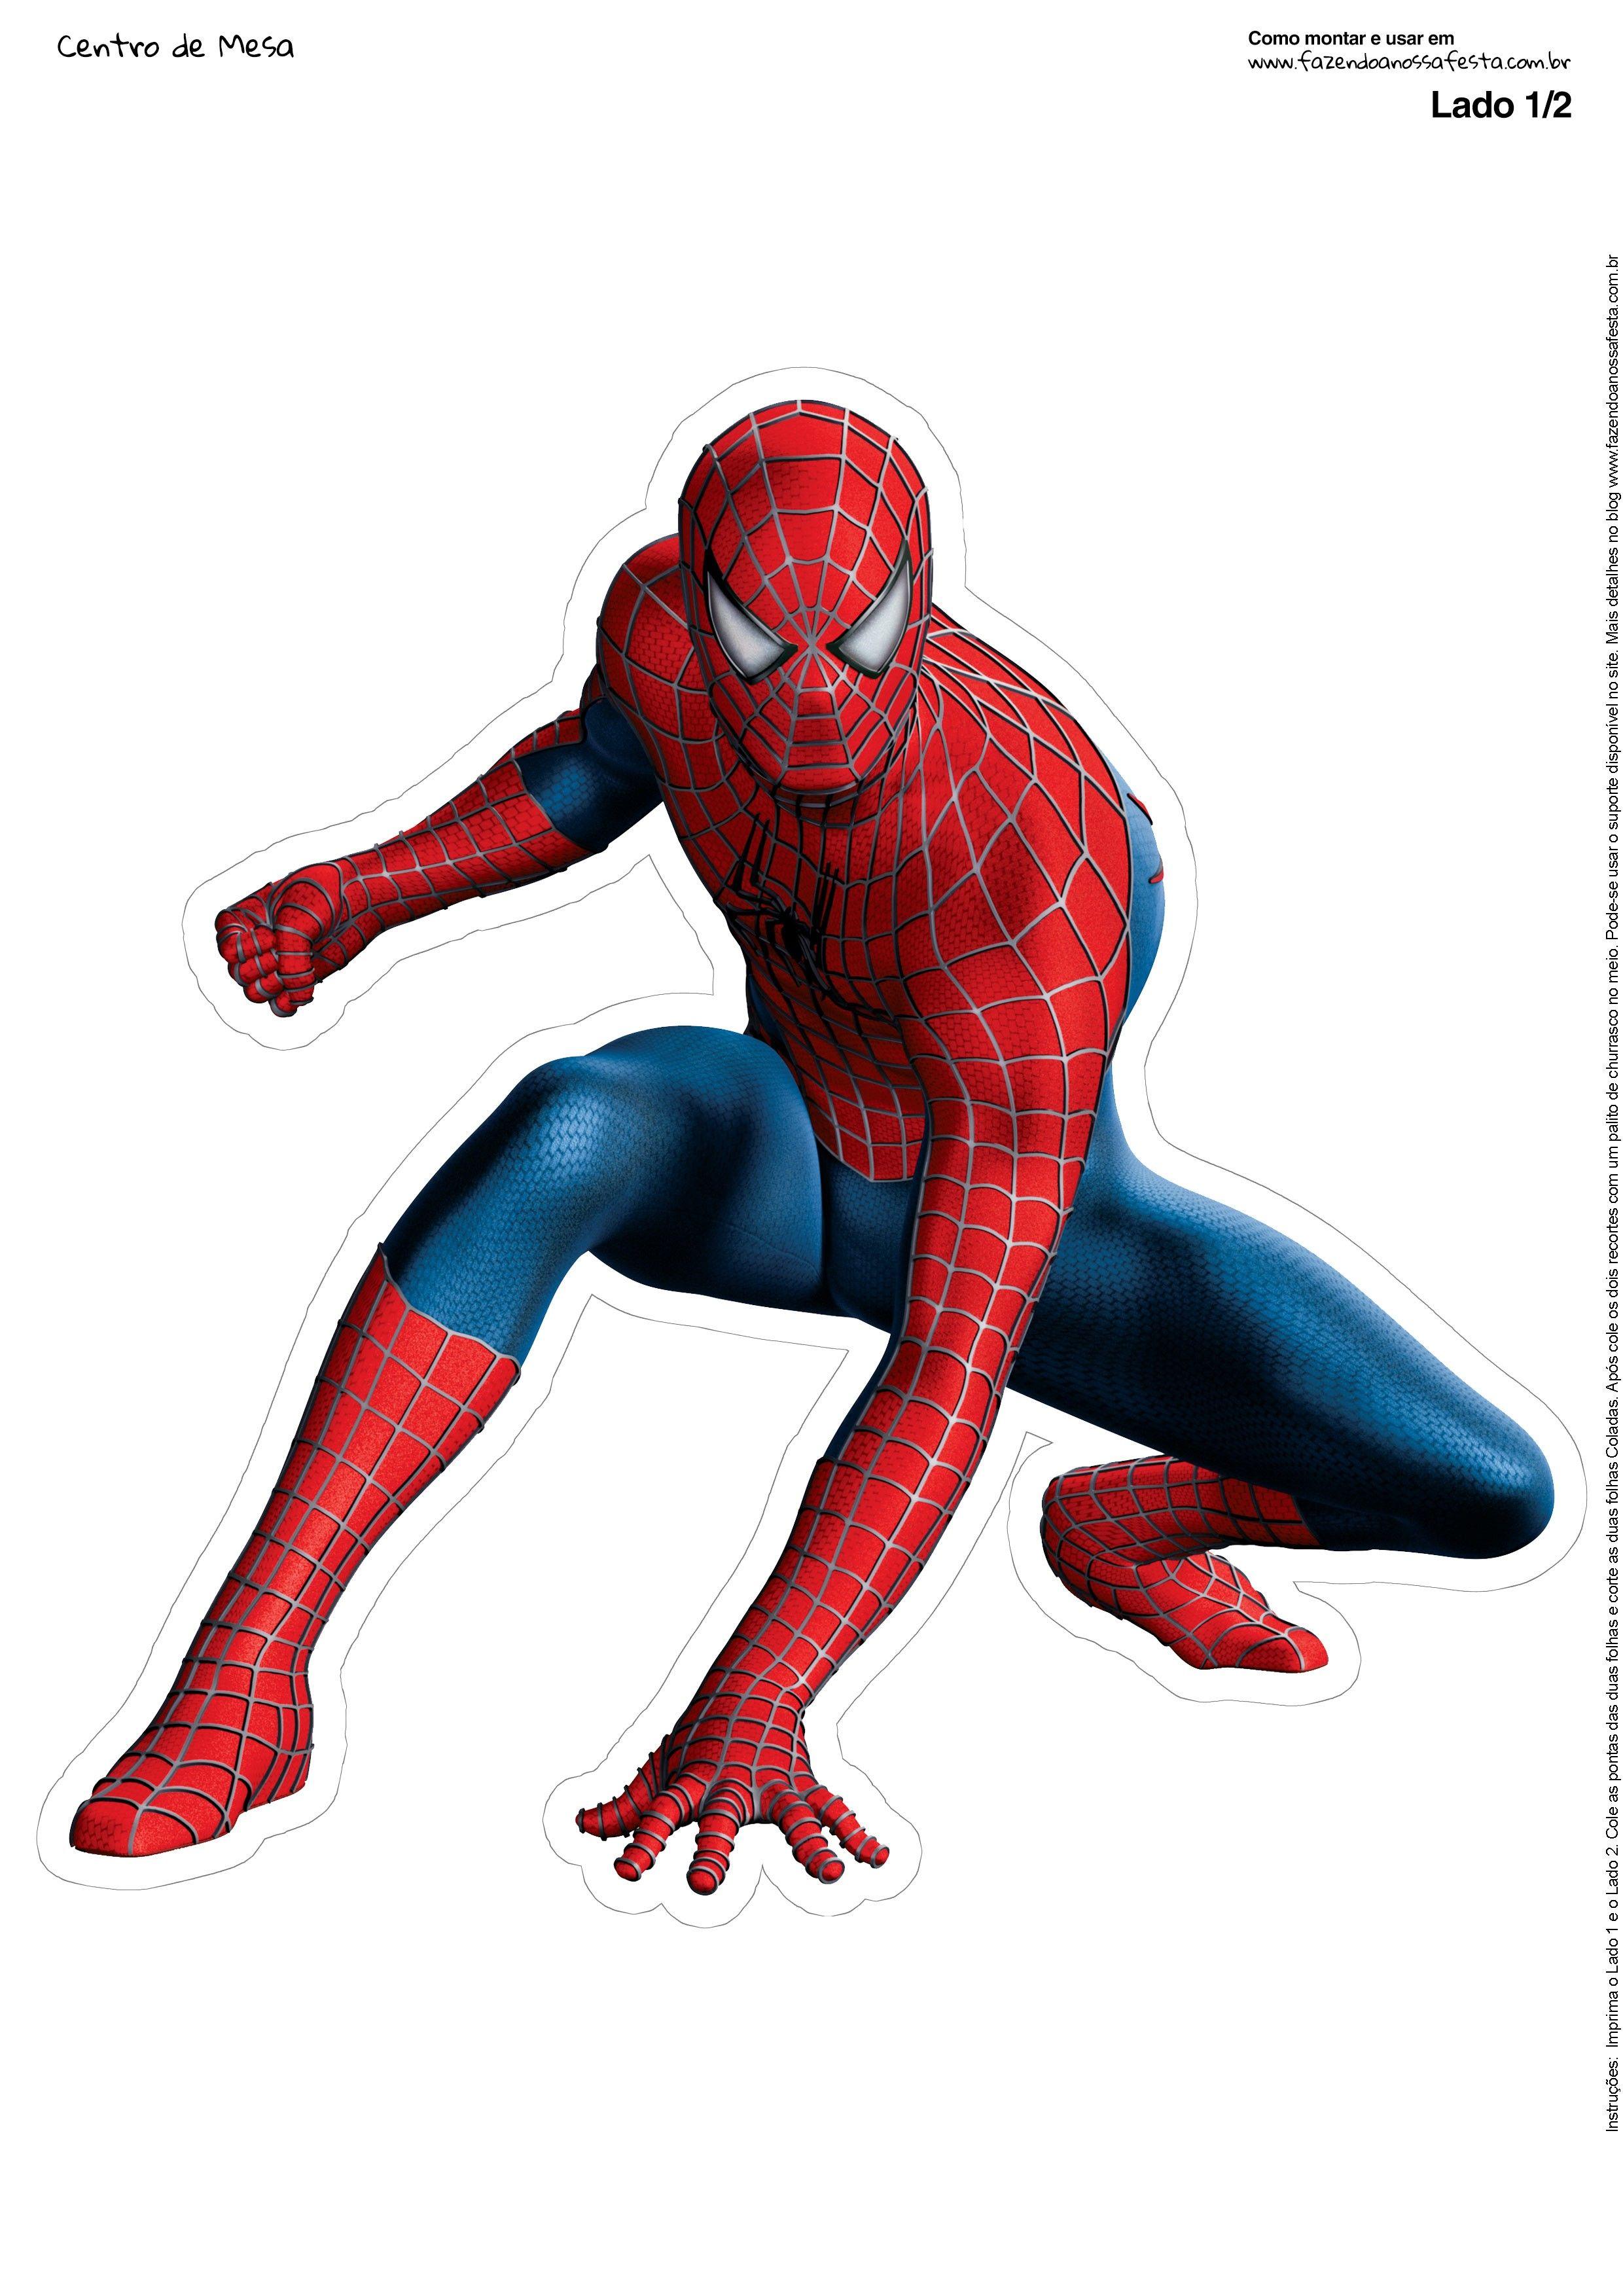 Centro de Mesa Homem Aranha - Parte 1 | Hombre araña, Cumple y El ...